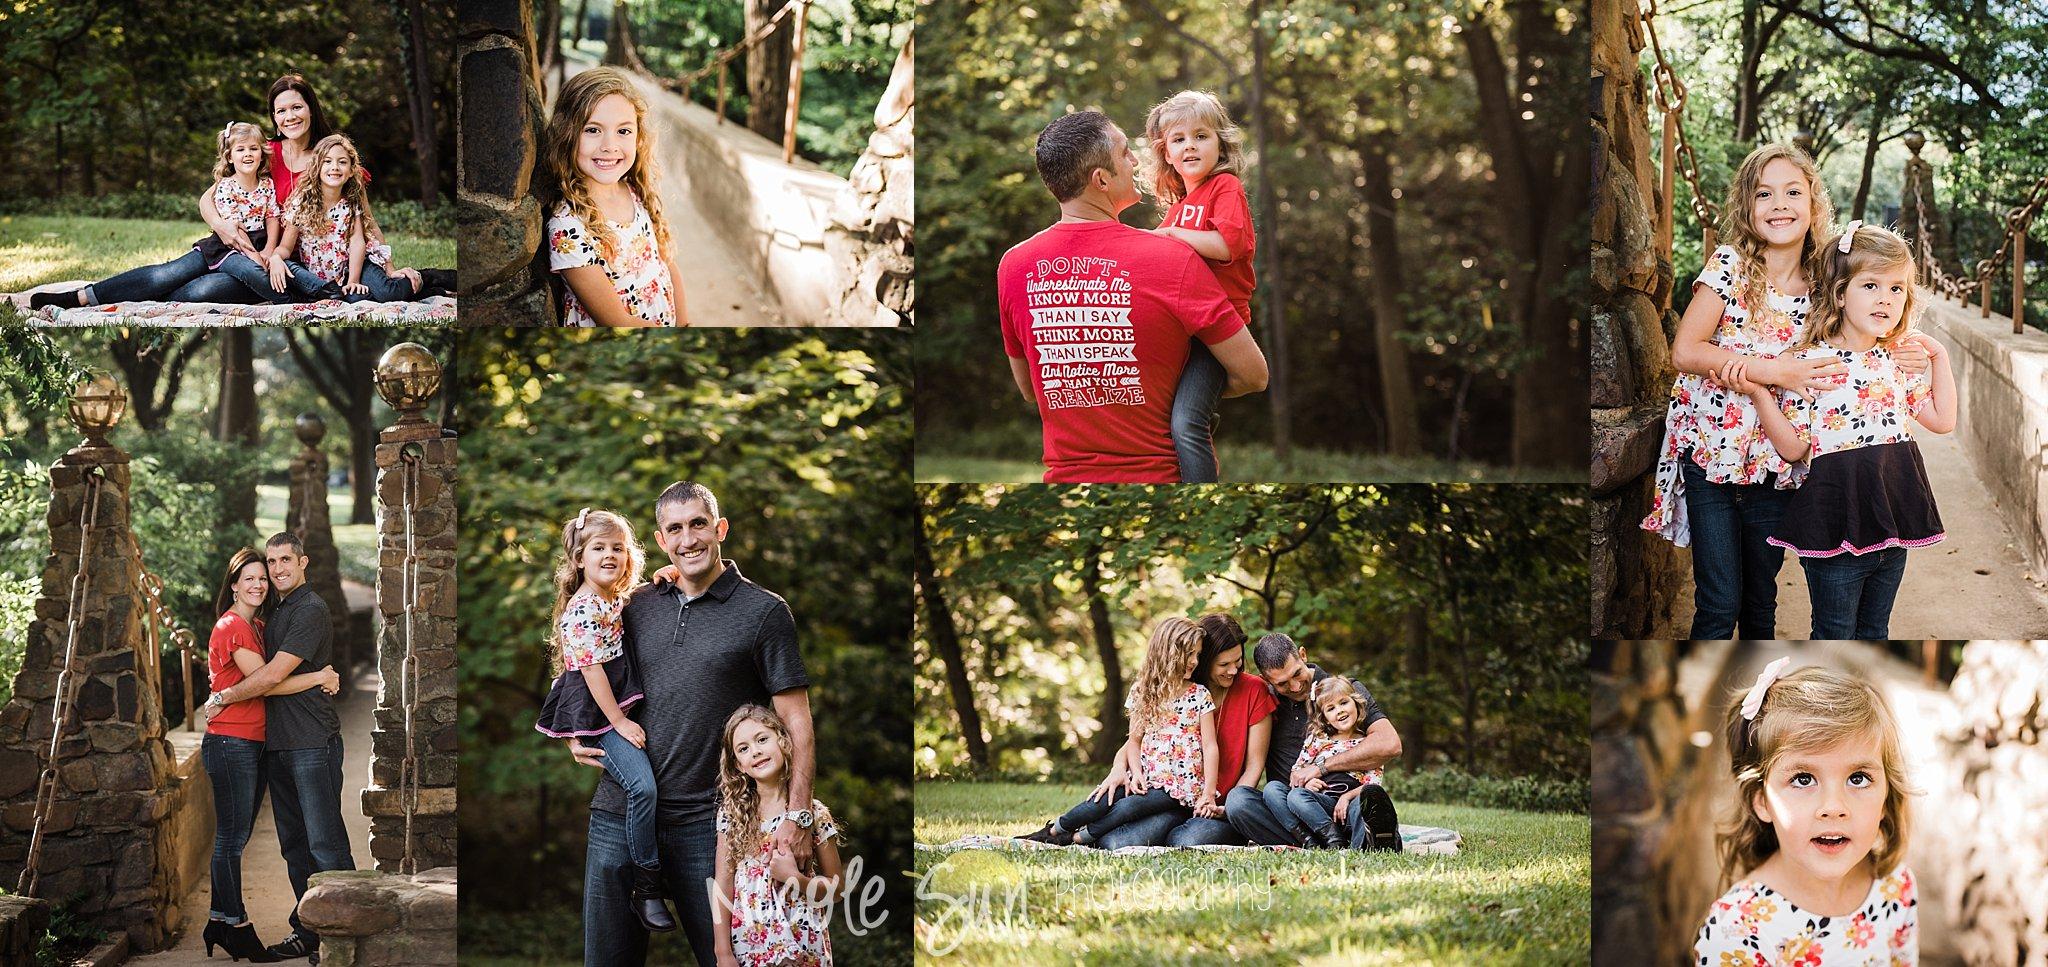 northdfwfamilyphotographer.jpg